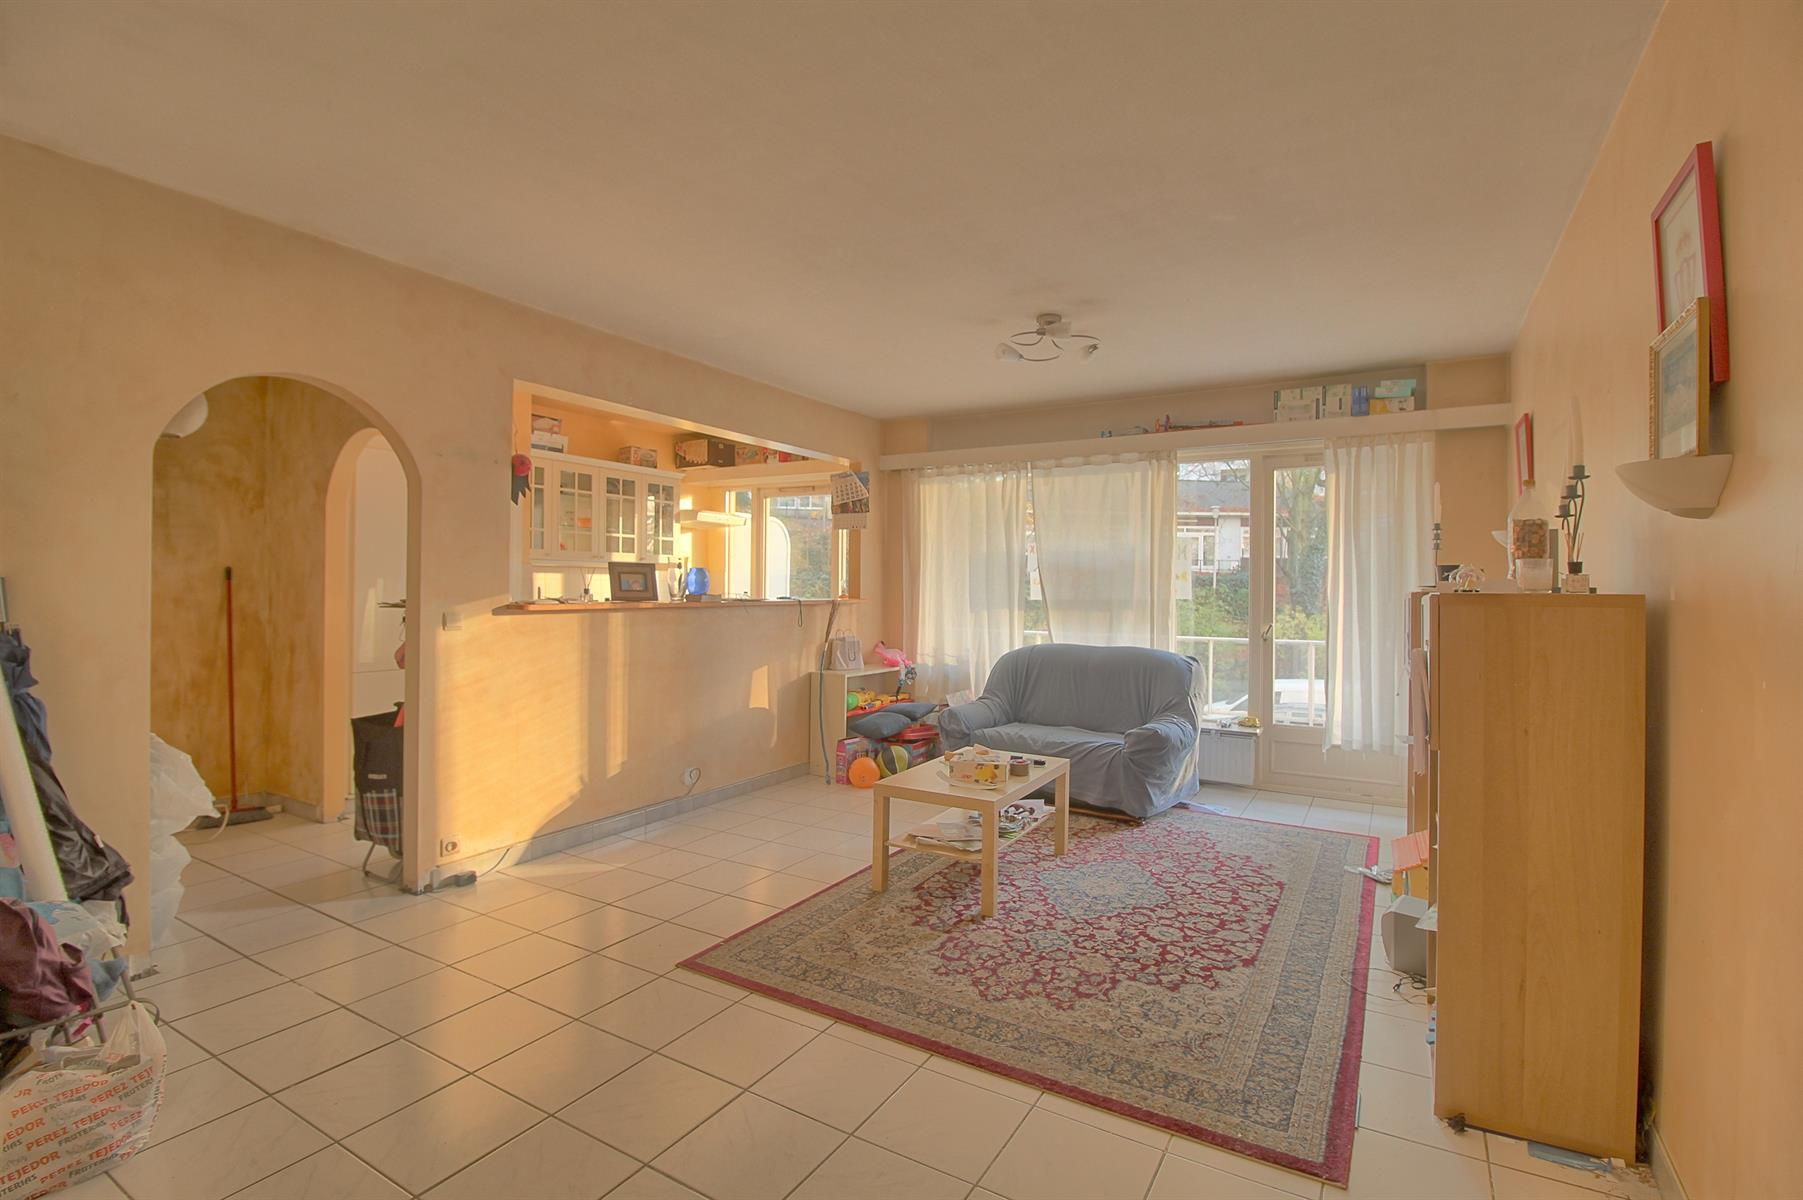 Appartement - Woluwe-Saint-Lambert - #4213719-0